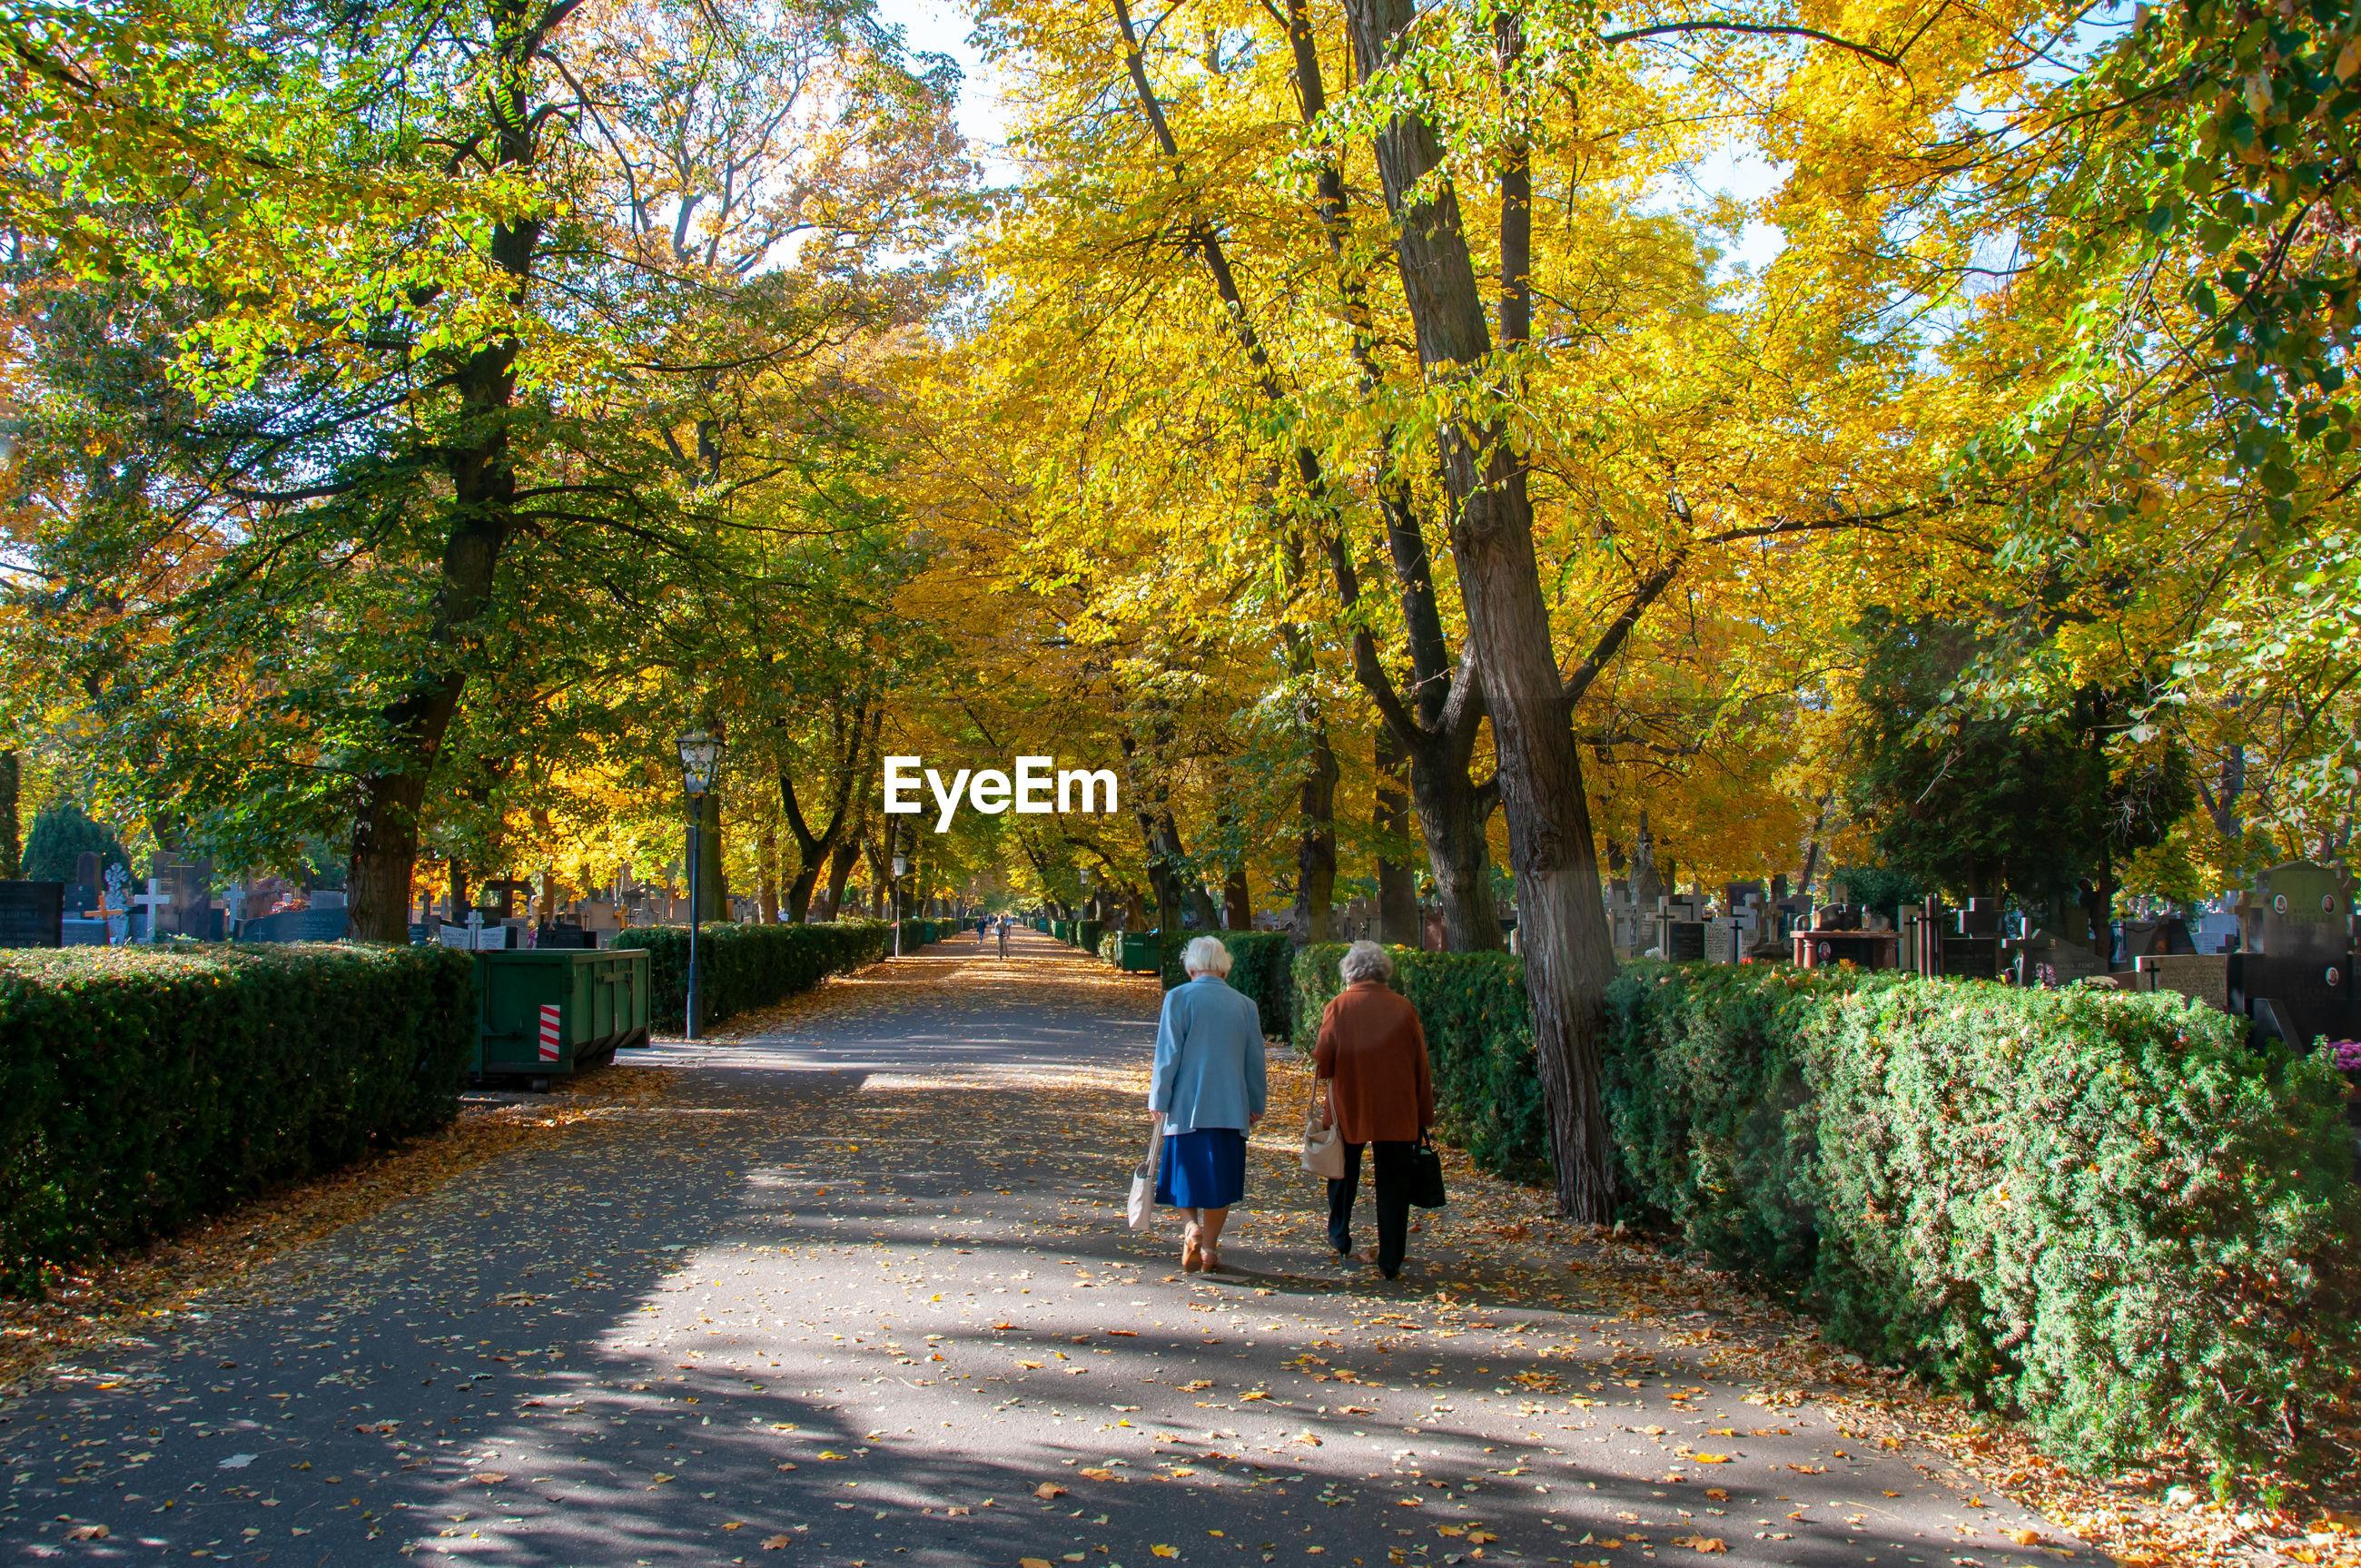 REAR VIEW OF PEOPLE WALKING ON FOOTPATH IN AUTUMN